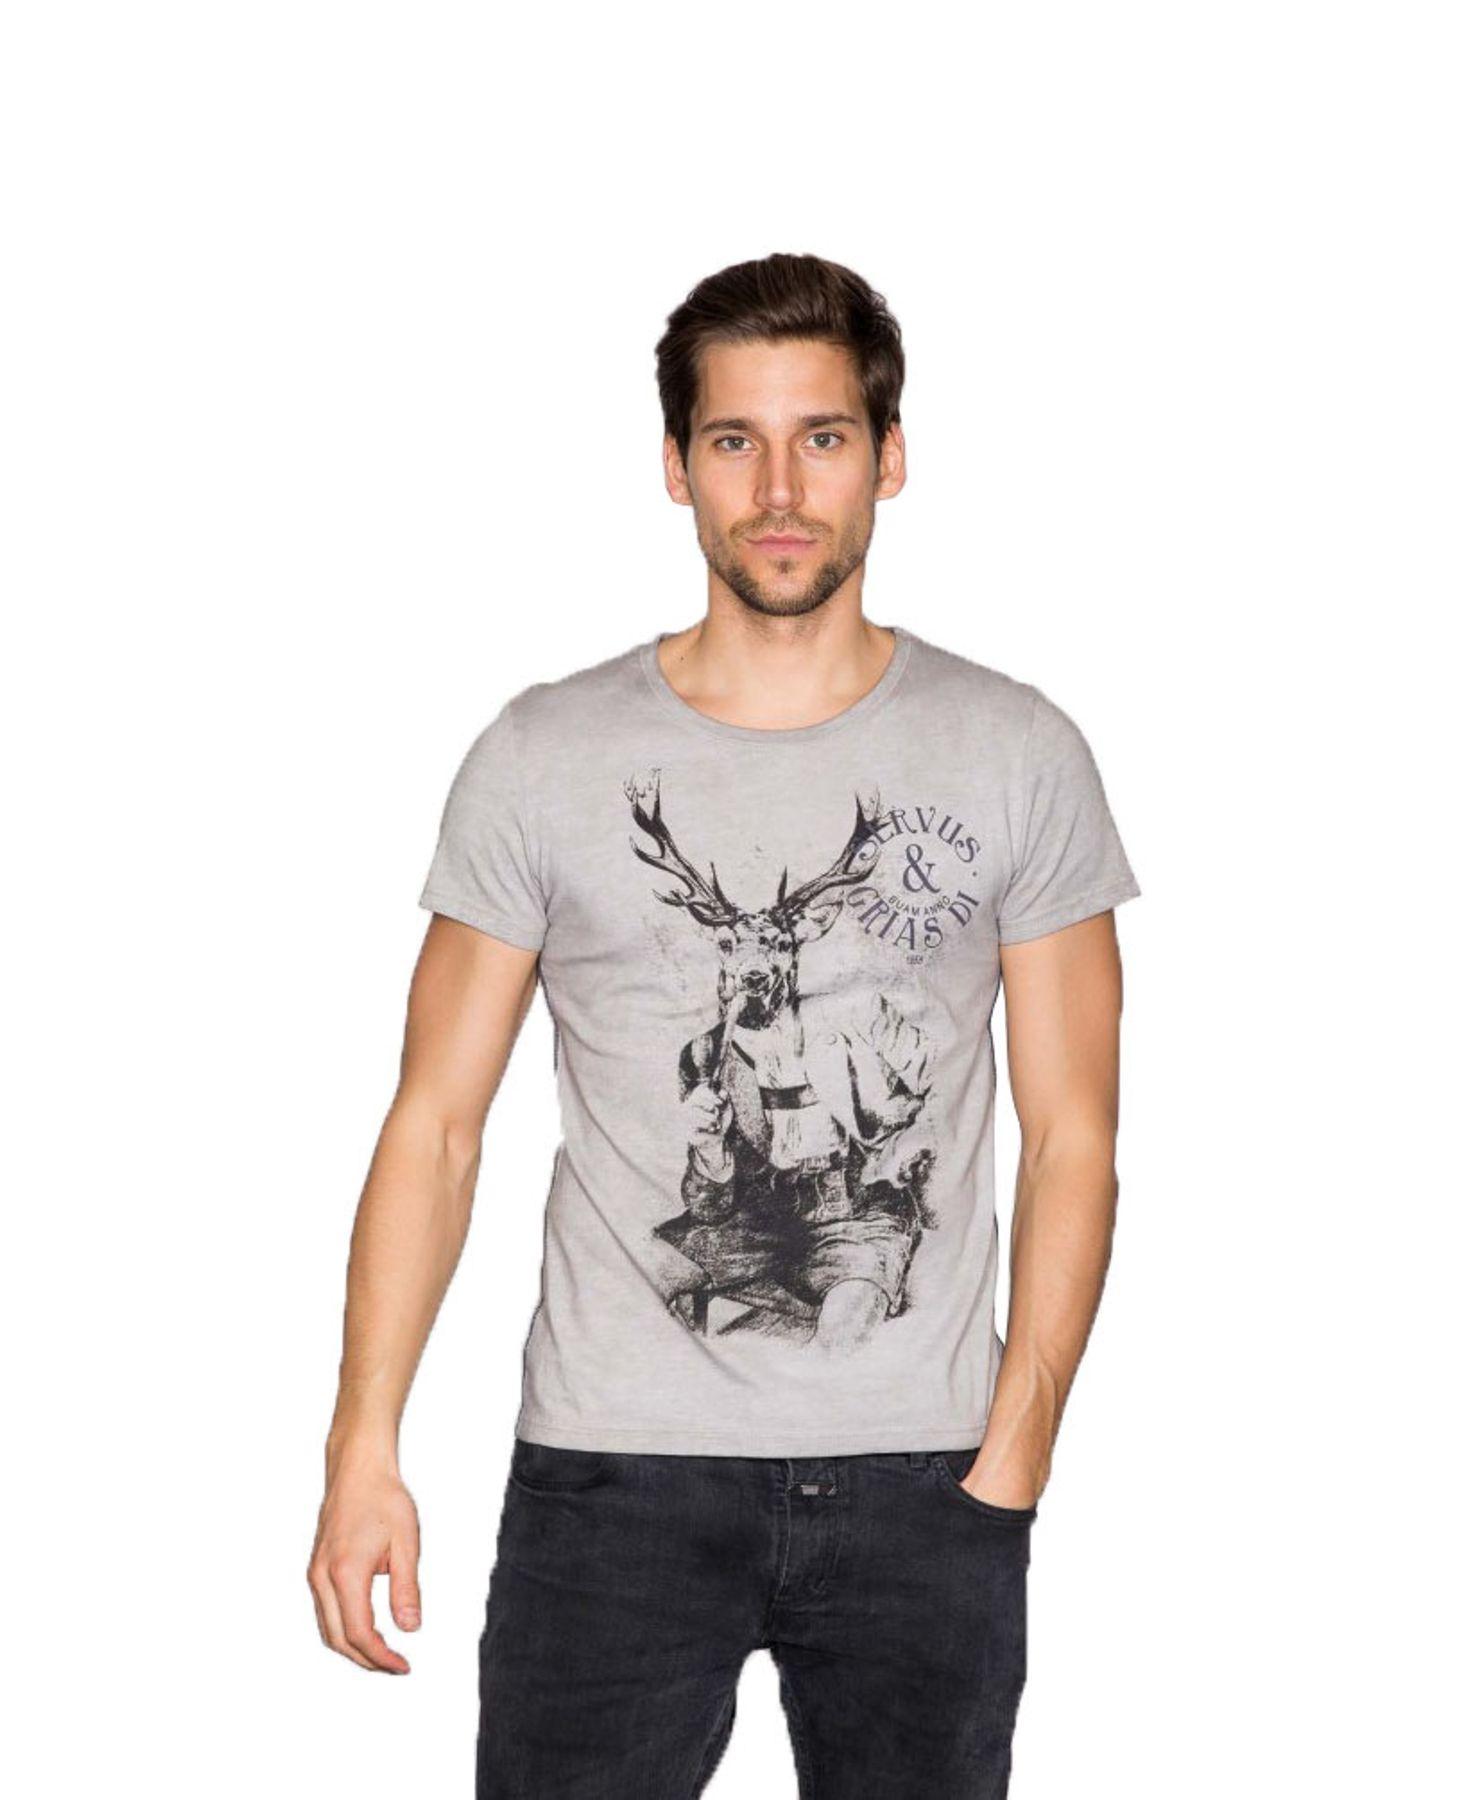 Krüger - Herren Trachten T-Shirt in grau, Grias Di (94200-43) – Bild 1